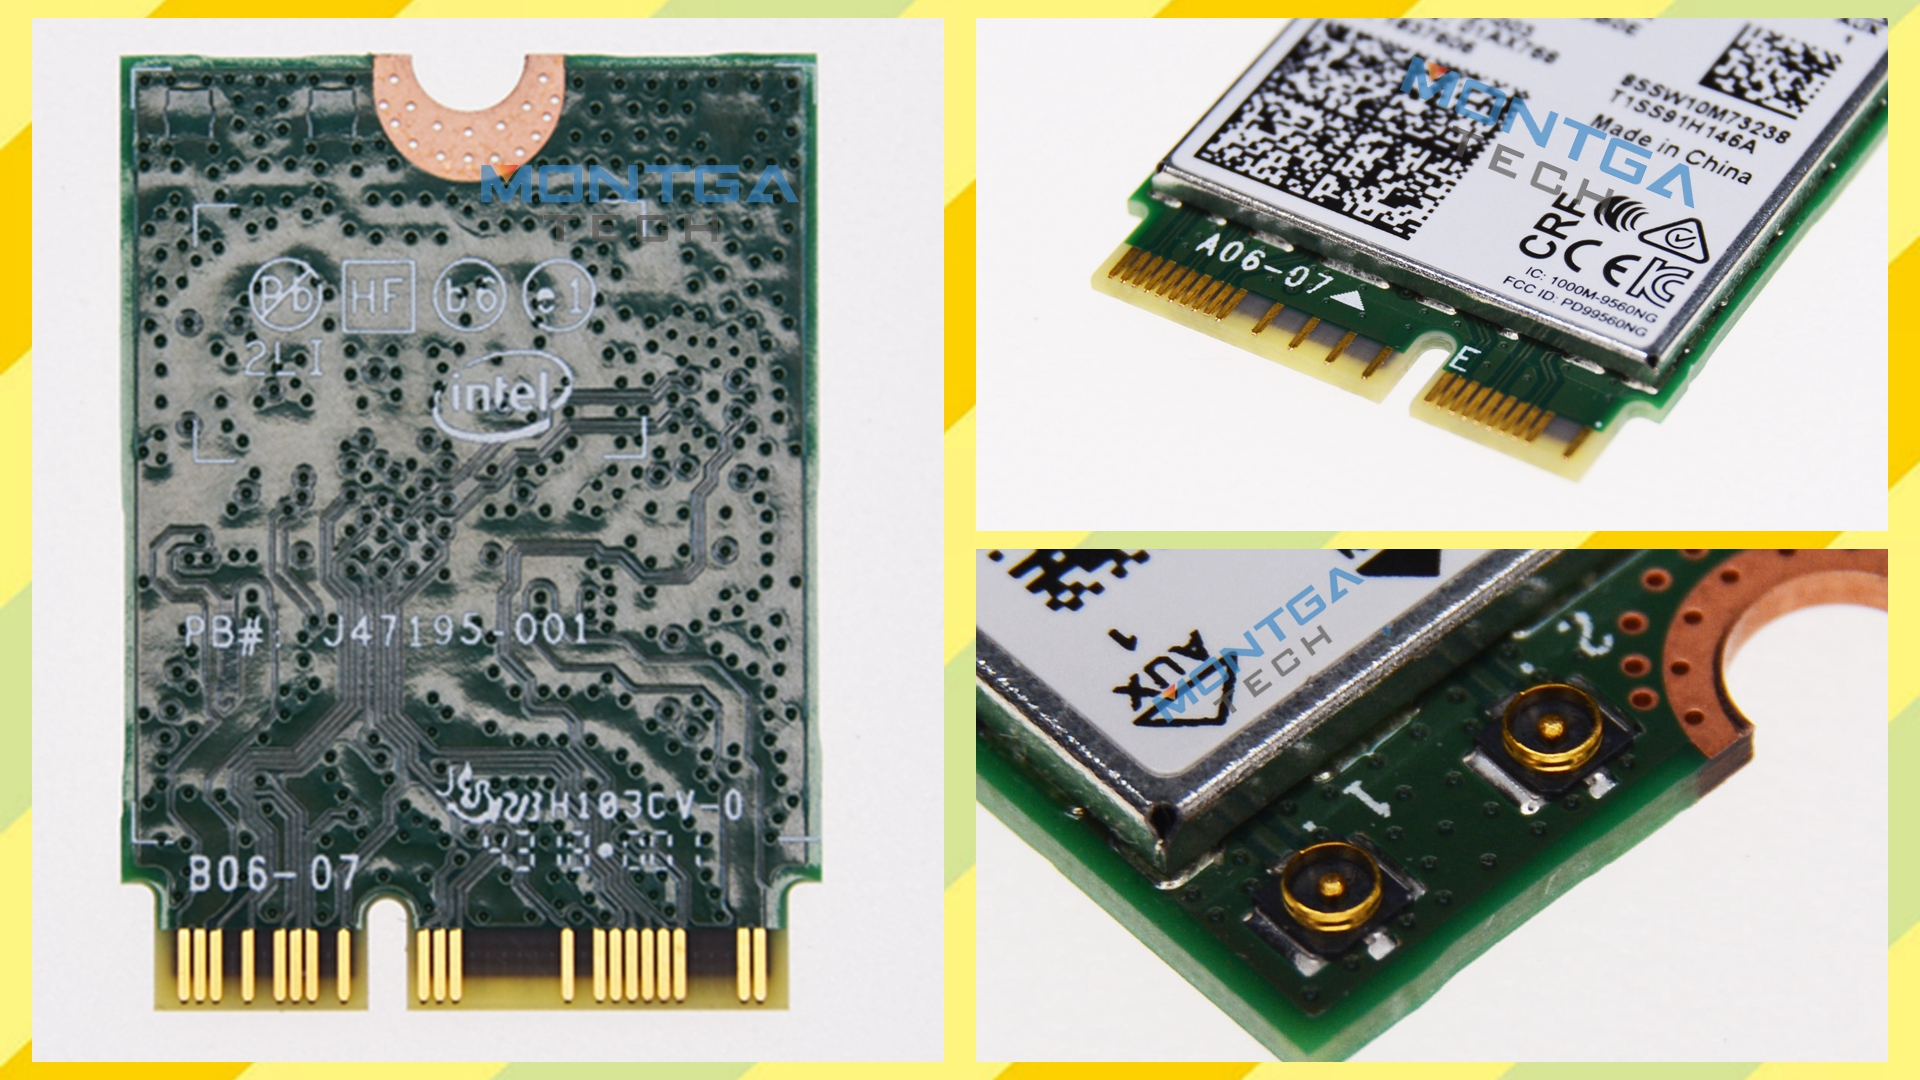 Asus UX580G Carte reseau, Asus UX580G carte sans fil, Asus UX580G carte WiFi, Asus UX580G carte interne, Asus UX580G carte bluetooth, Asus UX580G carte internet,